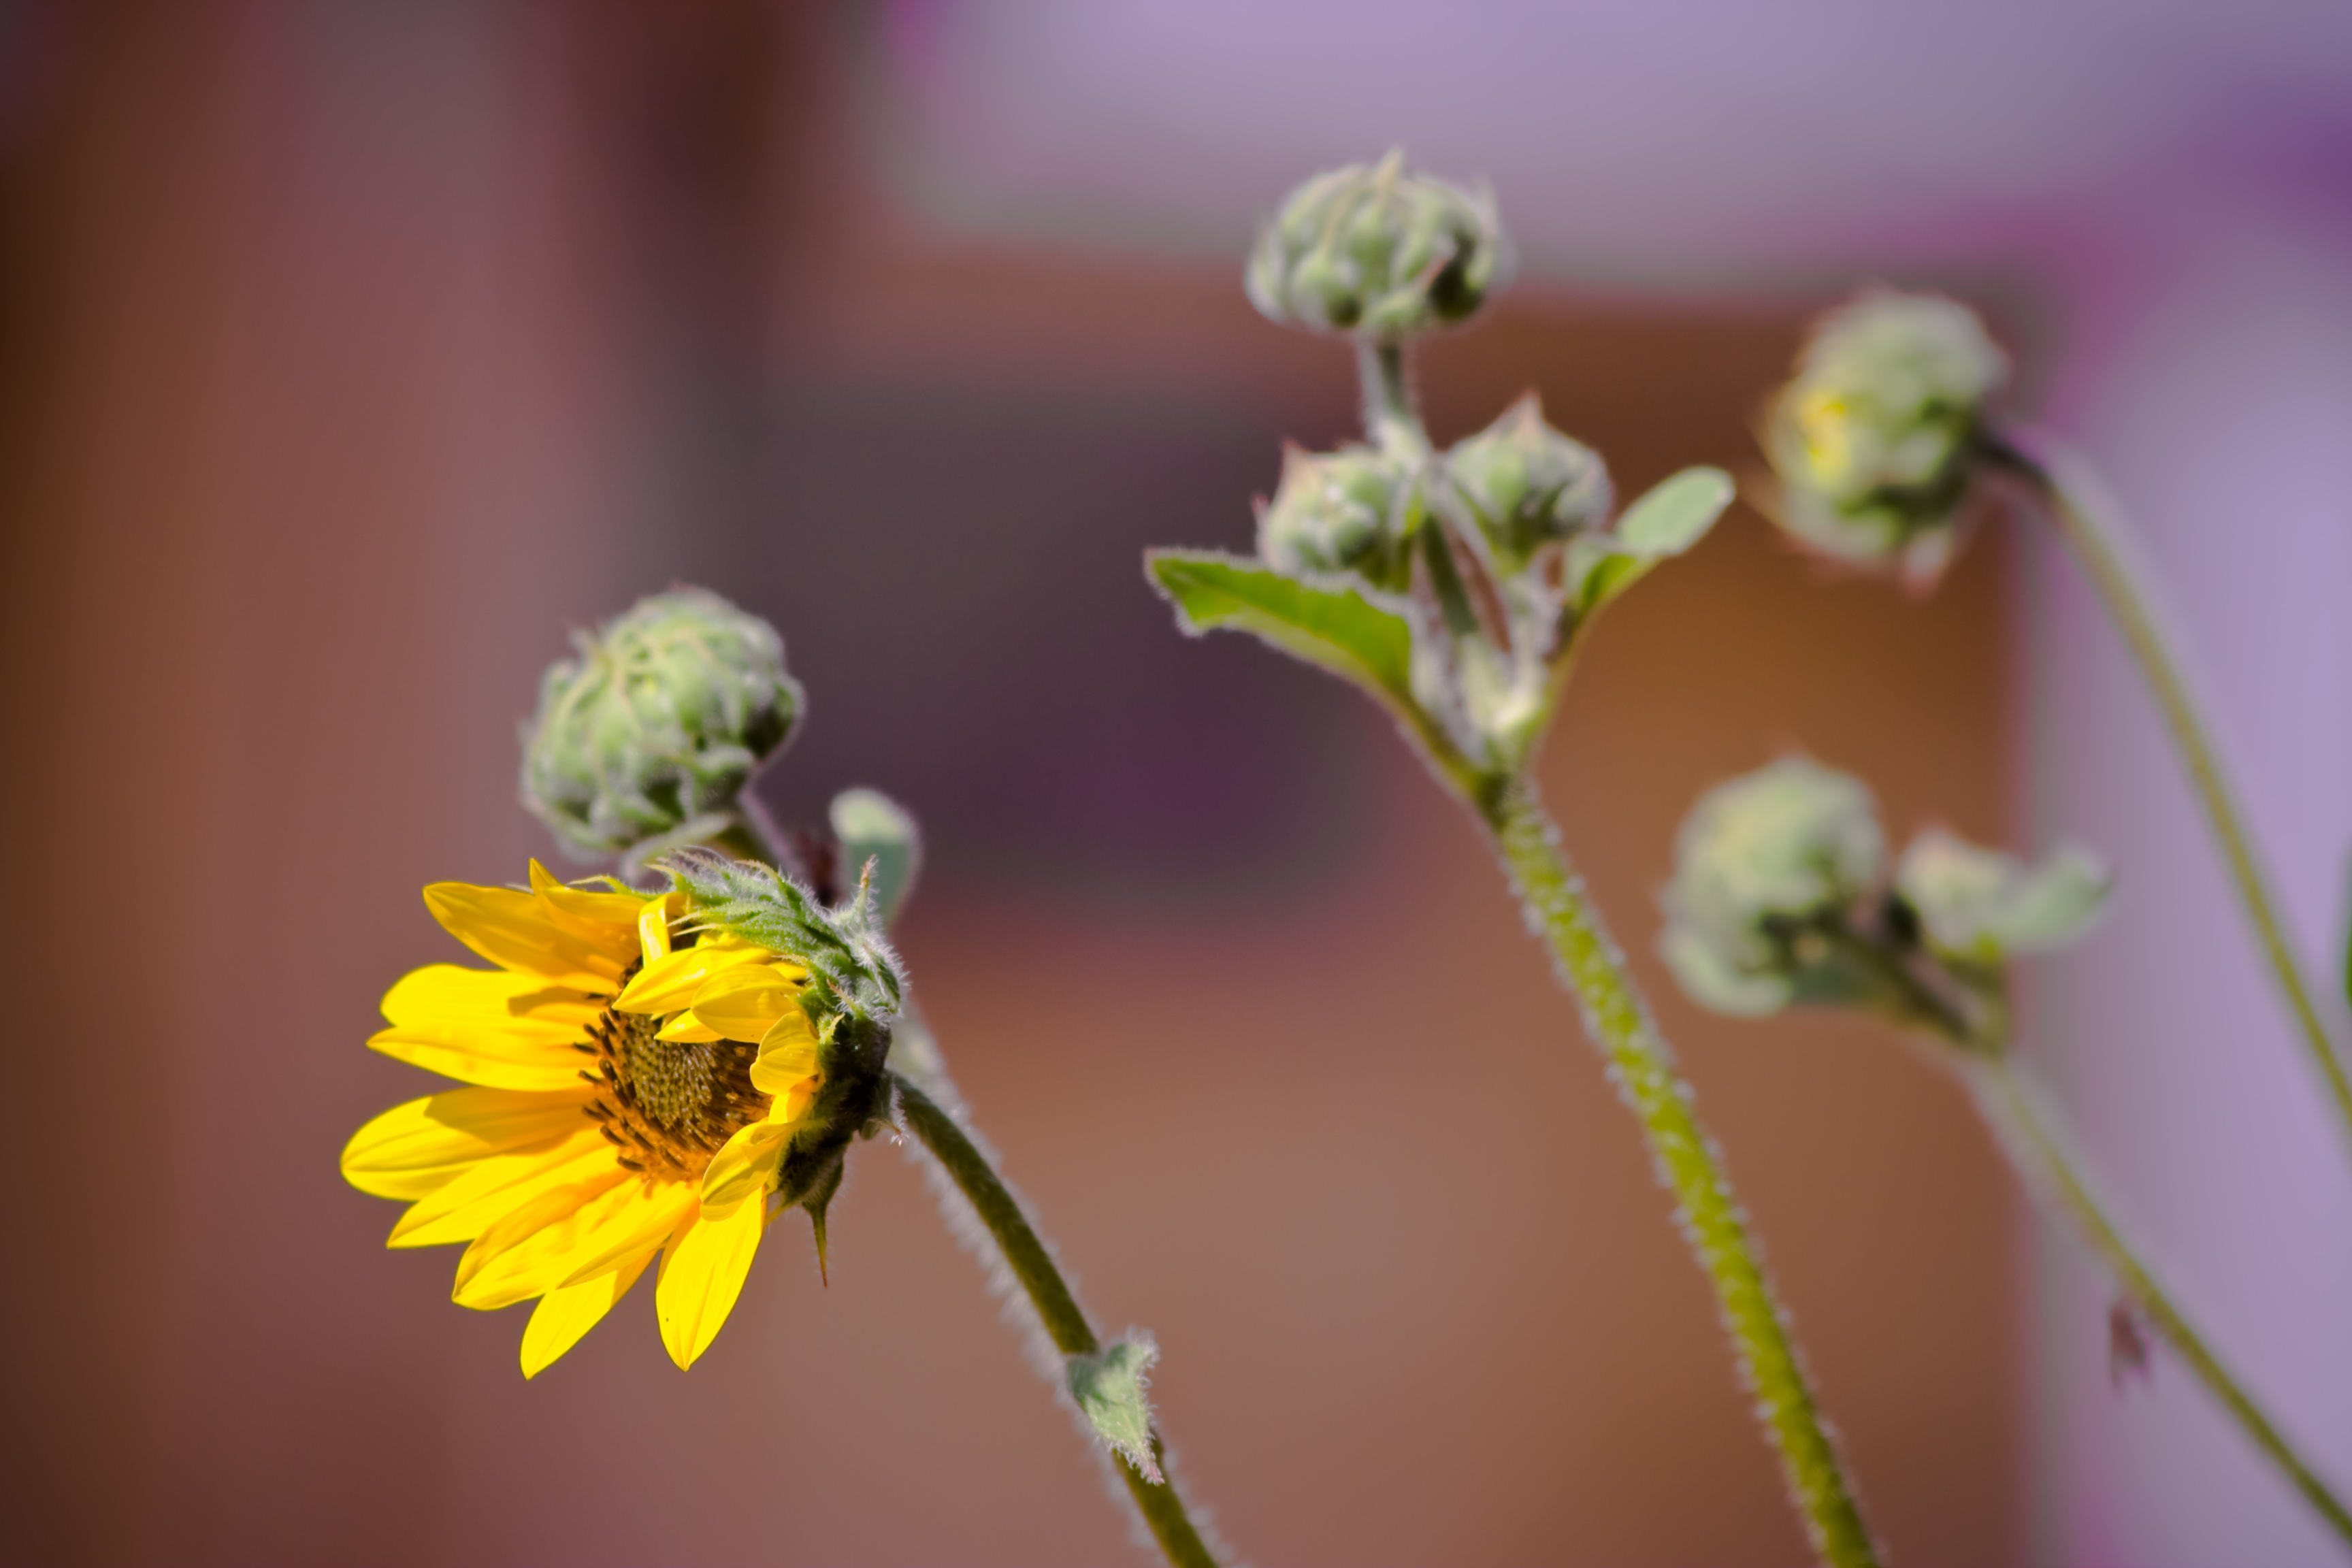 Yellow Sunflower, Blur, Flower, Green, Pedal, HQ Photo